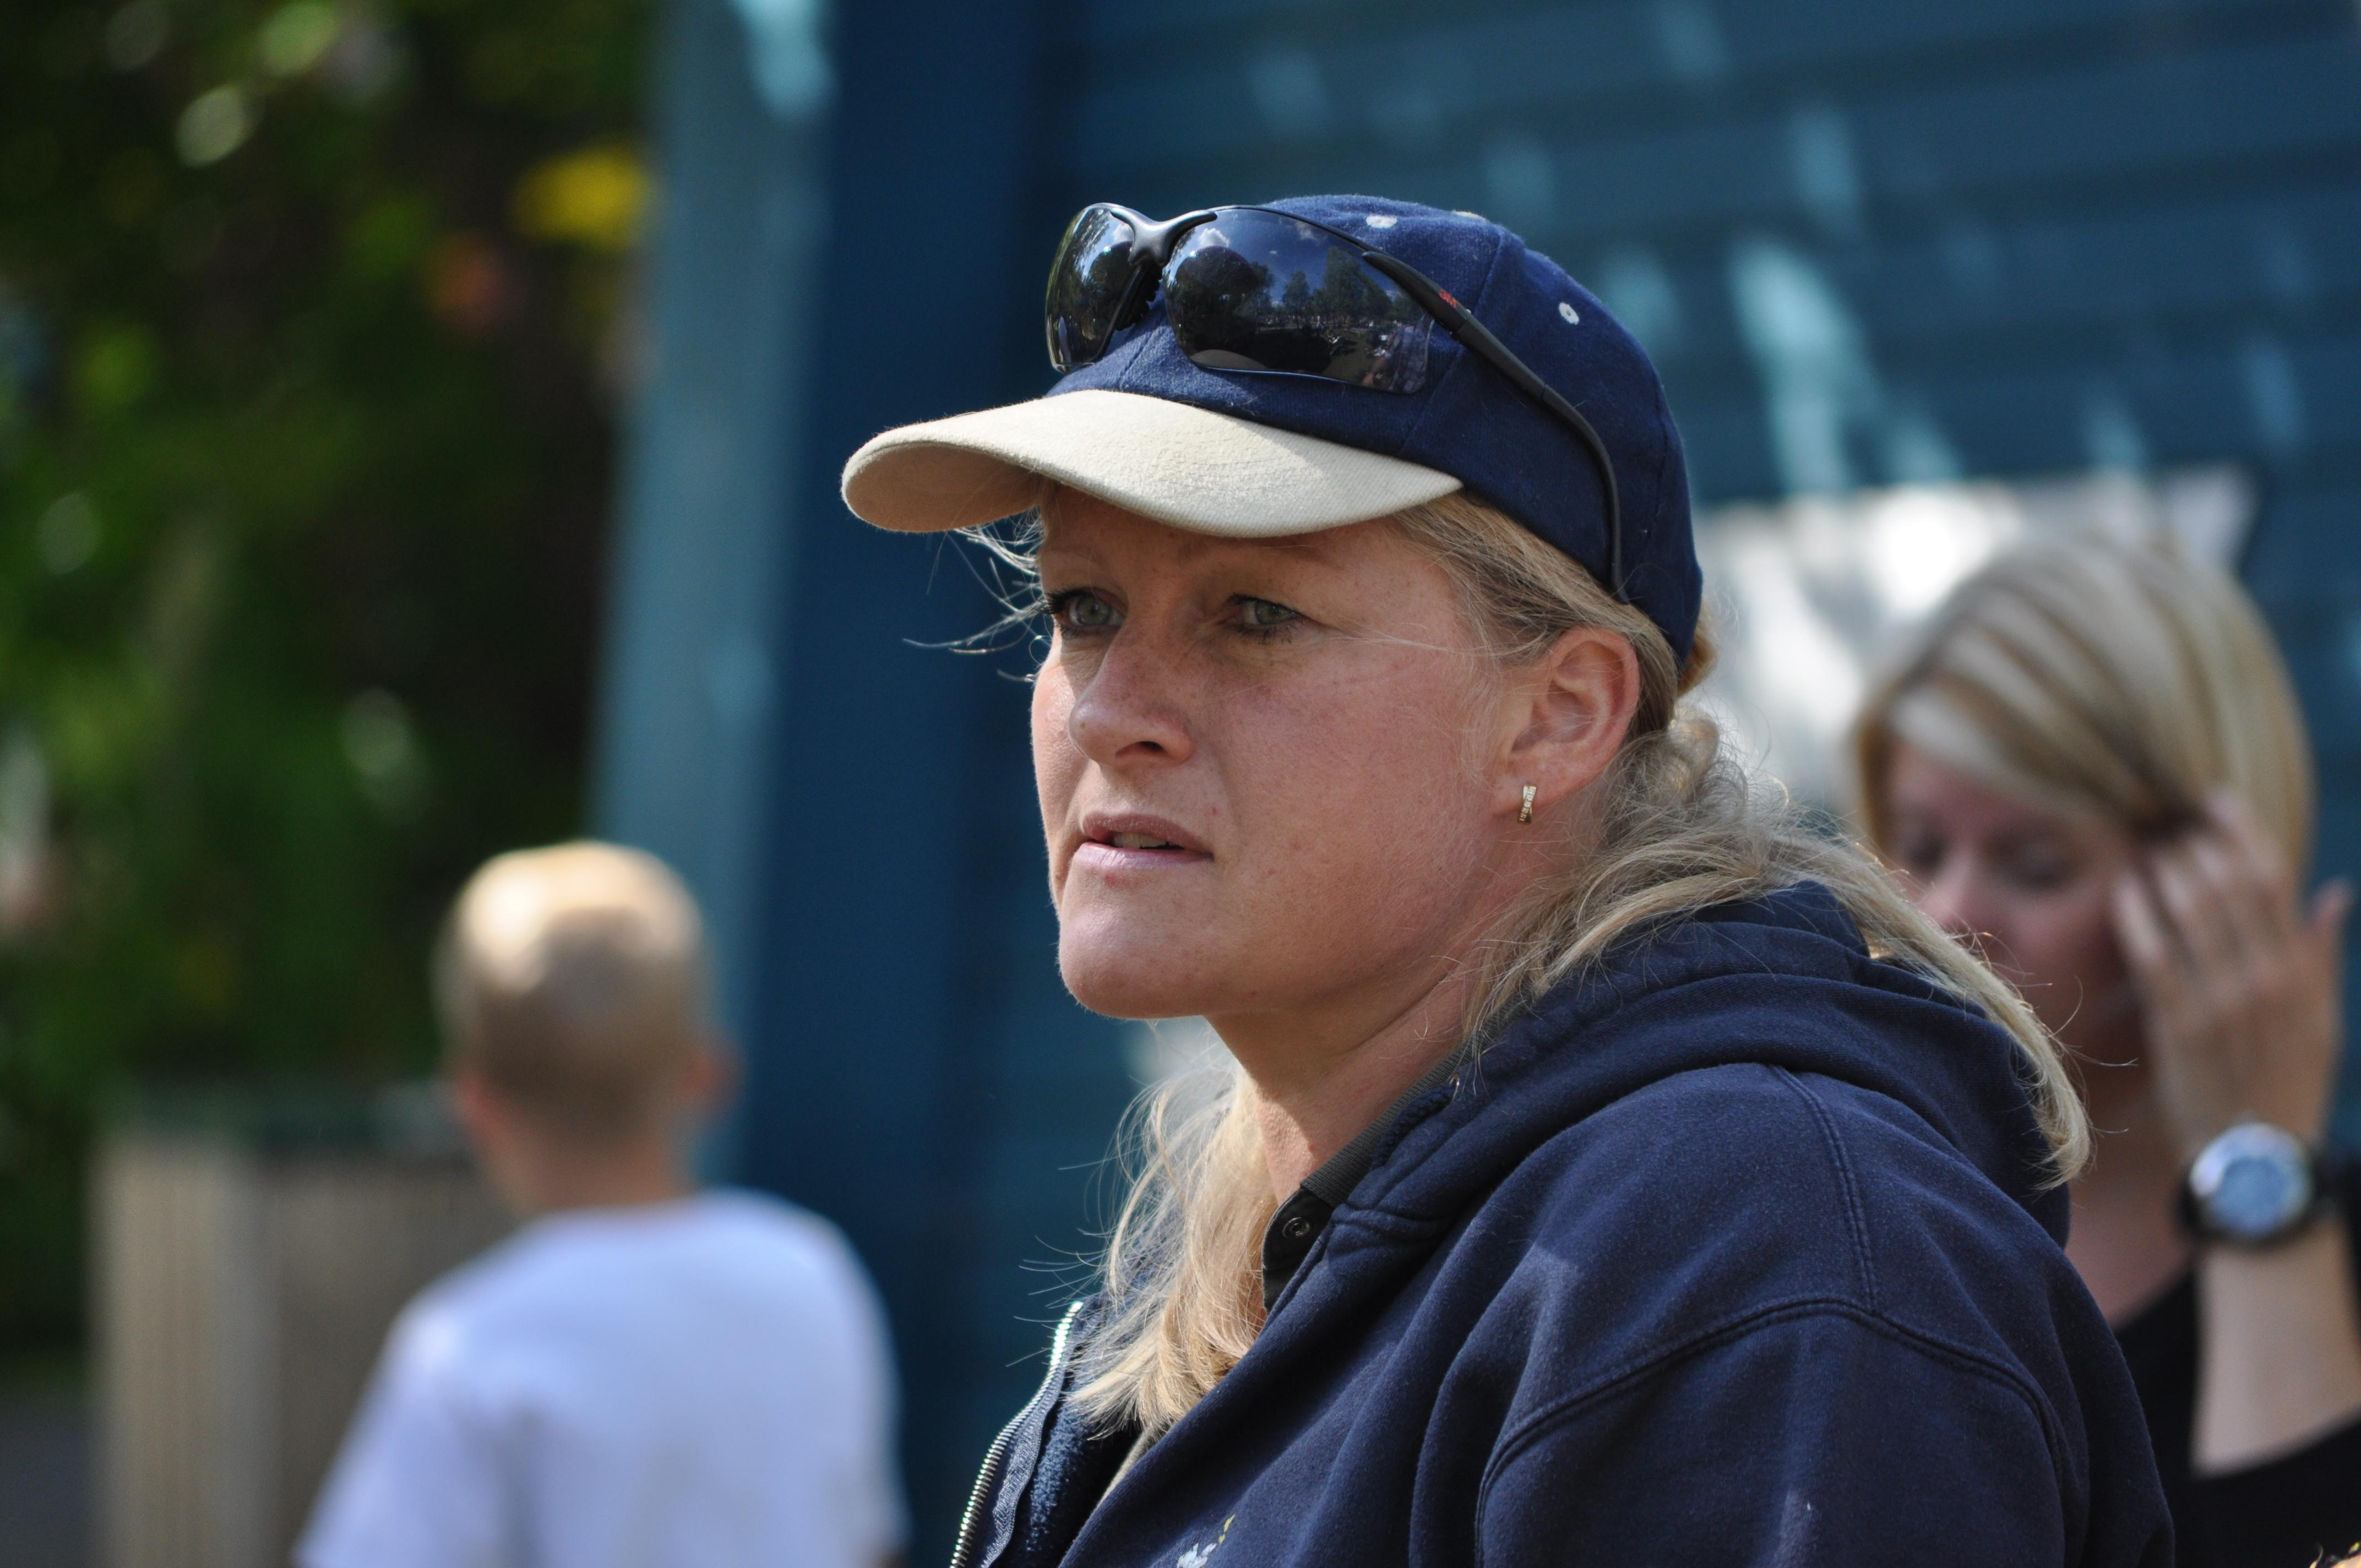 Christine Skovgaard Sørensen